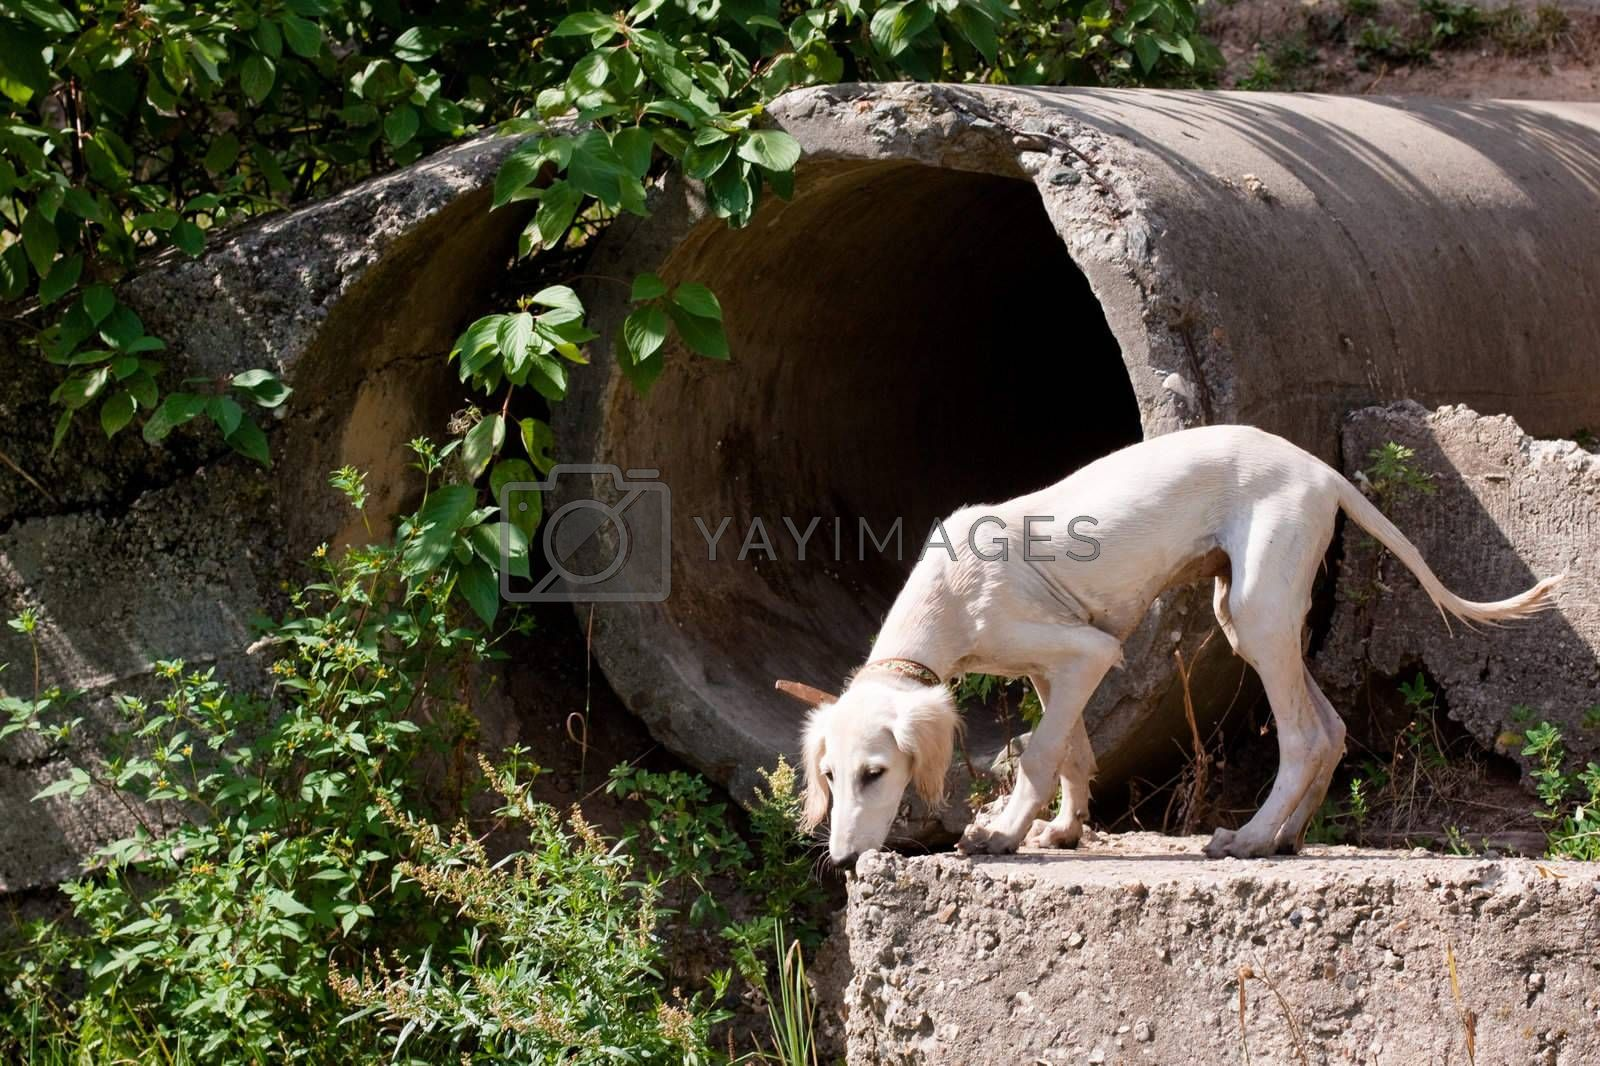 A standing white saluki pup and big concrete pipe